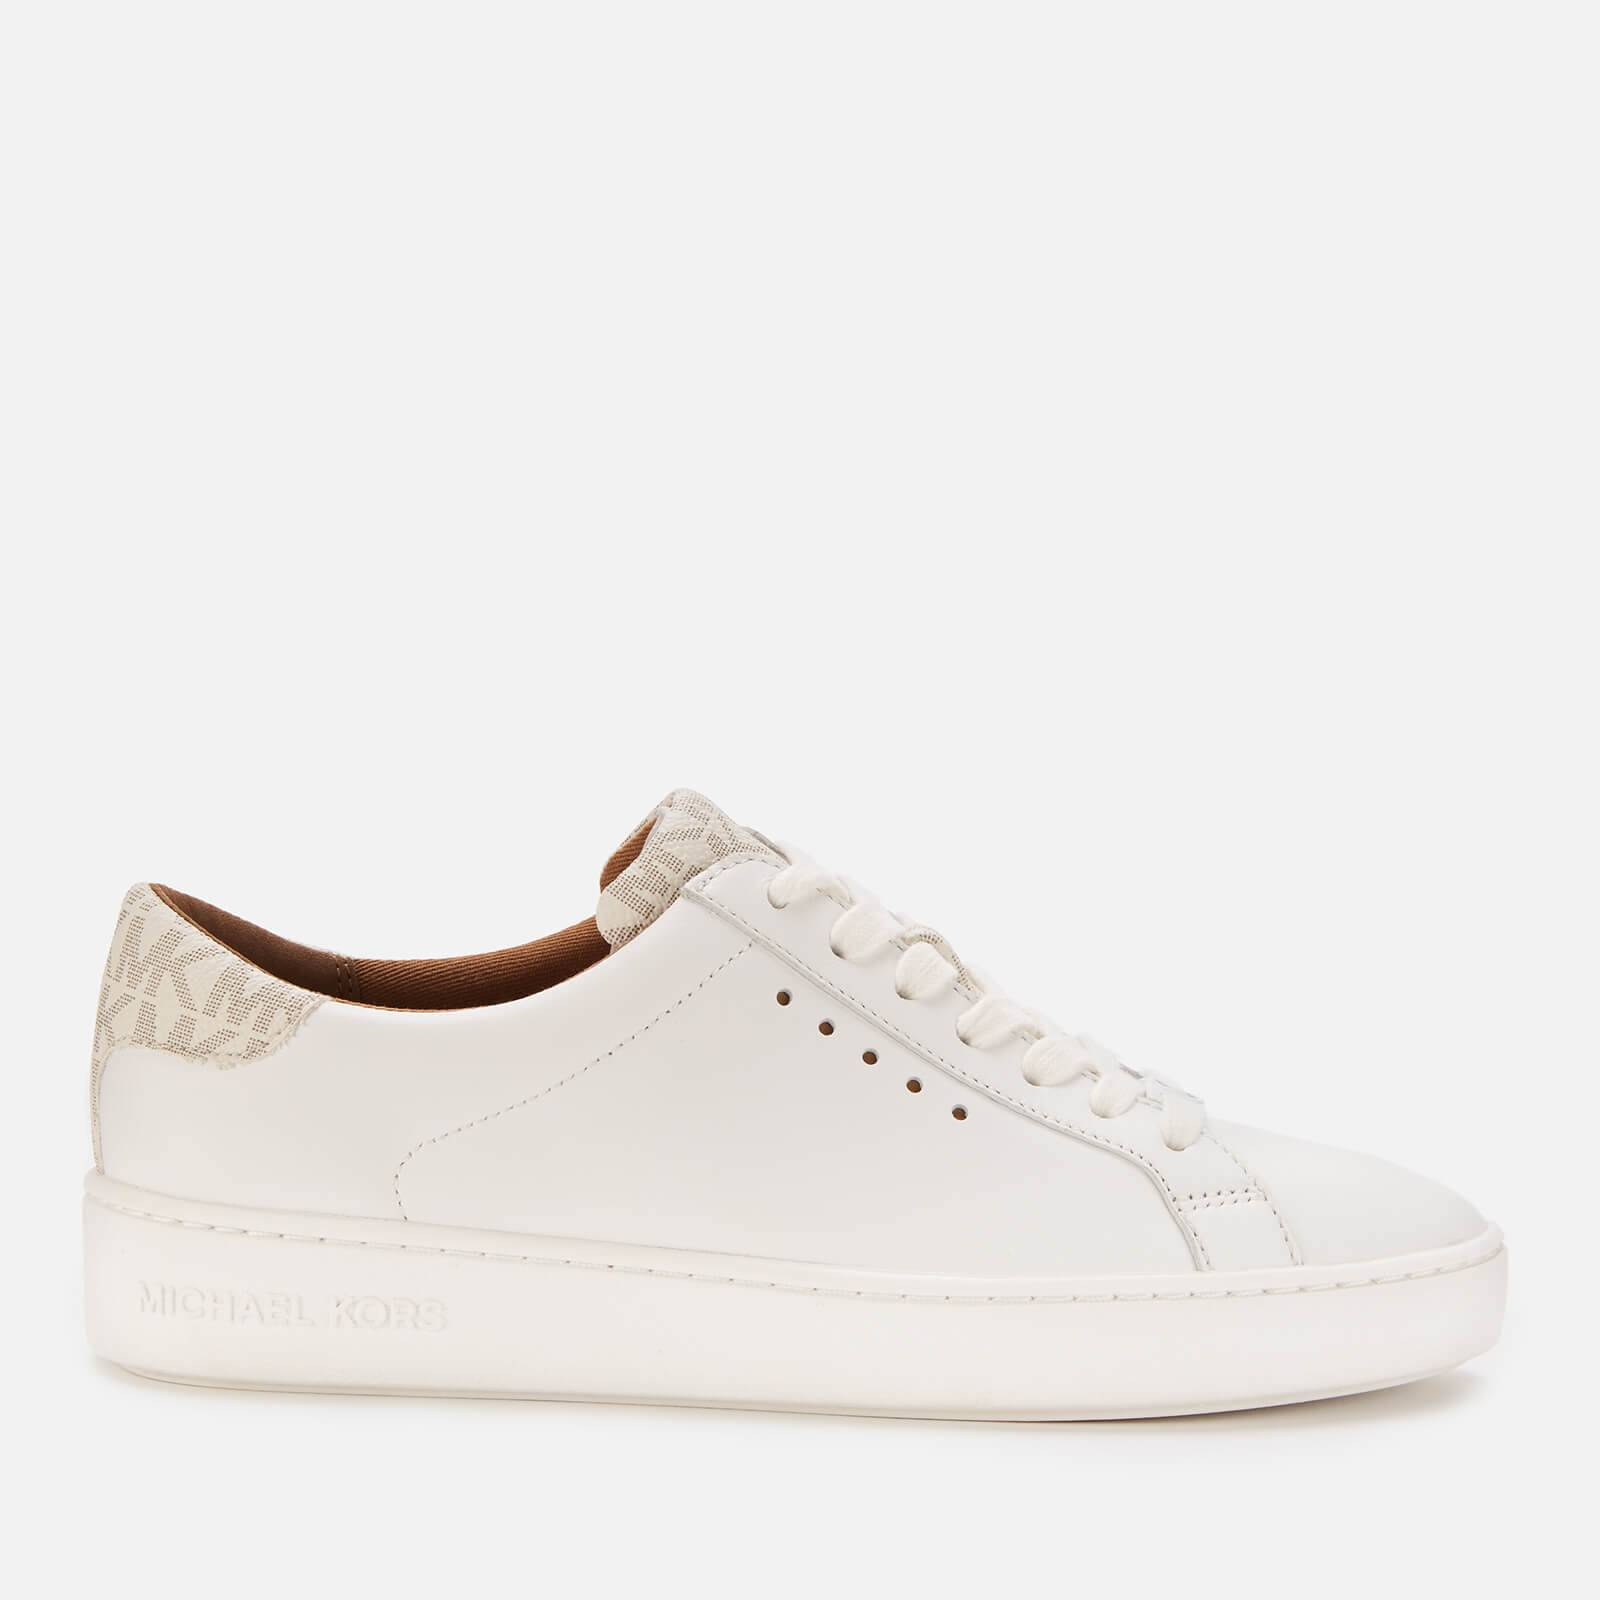 MICHAEL MICHAEL KORS Women's Irving Leather Cupsole Trainers - Optic White/Vanilla - UK 4/US 7 - White